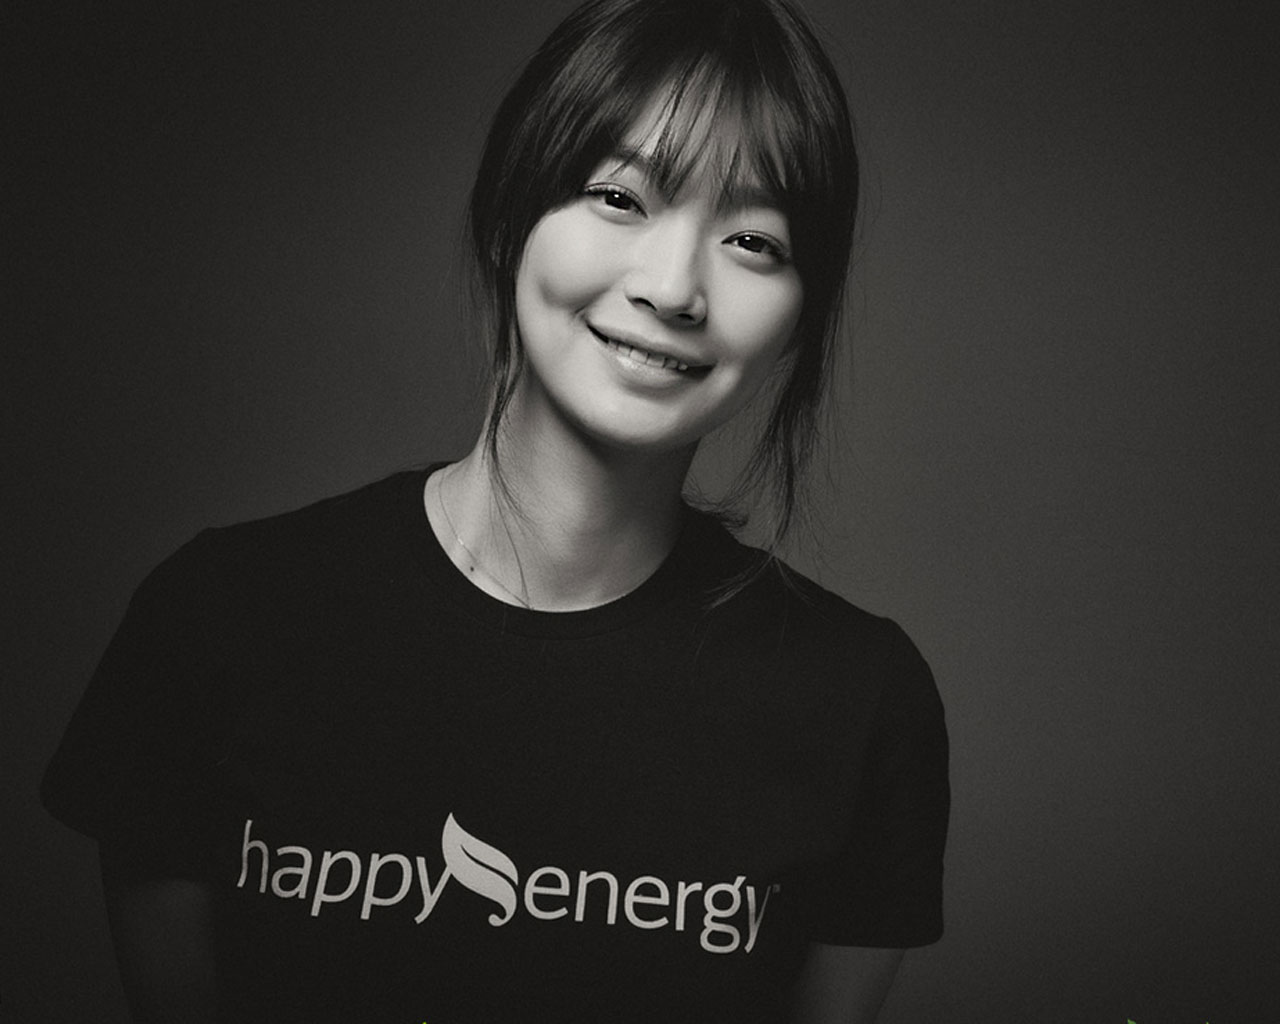 http://3.bp.blogspot.com/-2iv-hjjDHH8/T5I-ArsHygI/AAAAAAAAAn0/dtvC1abnH3Q/s1600/shin-min-ah+happy+energi.jpg